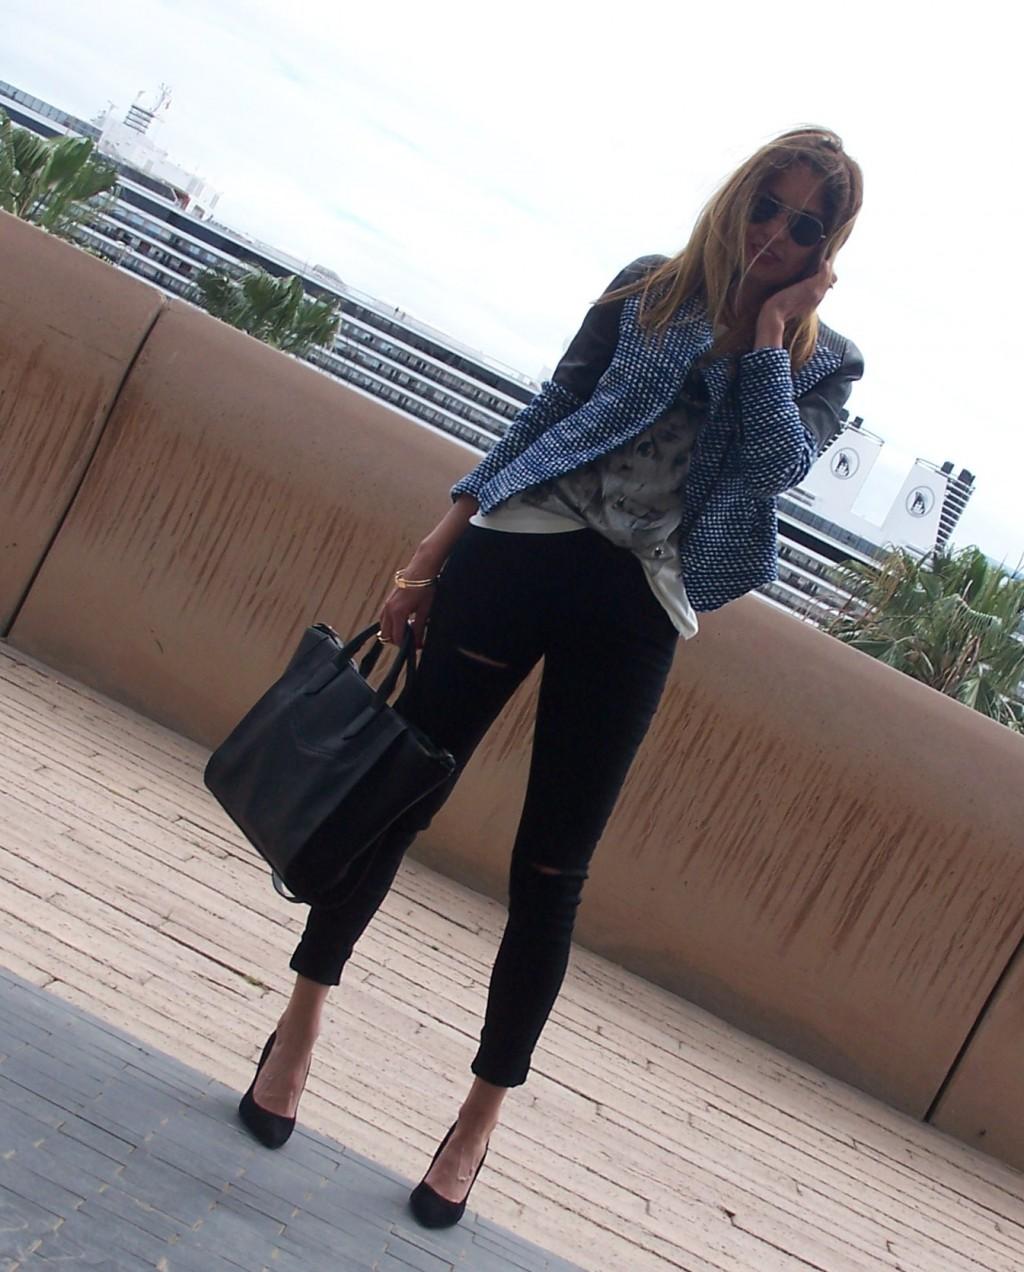 Chanelera+Jeans Mordiscos-947-sdiosas